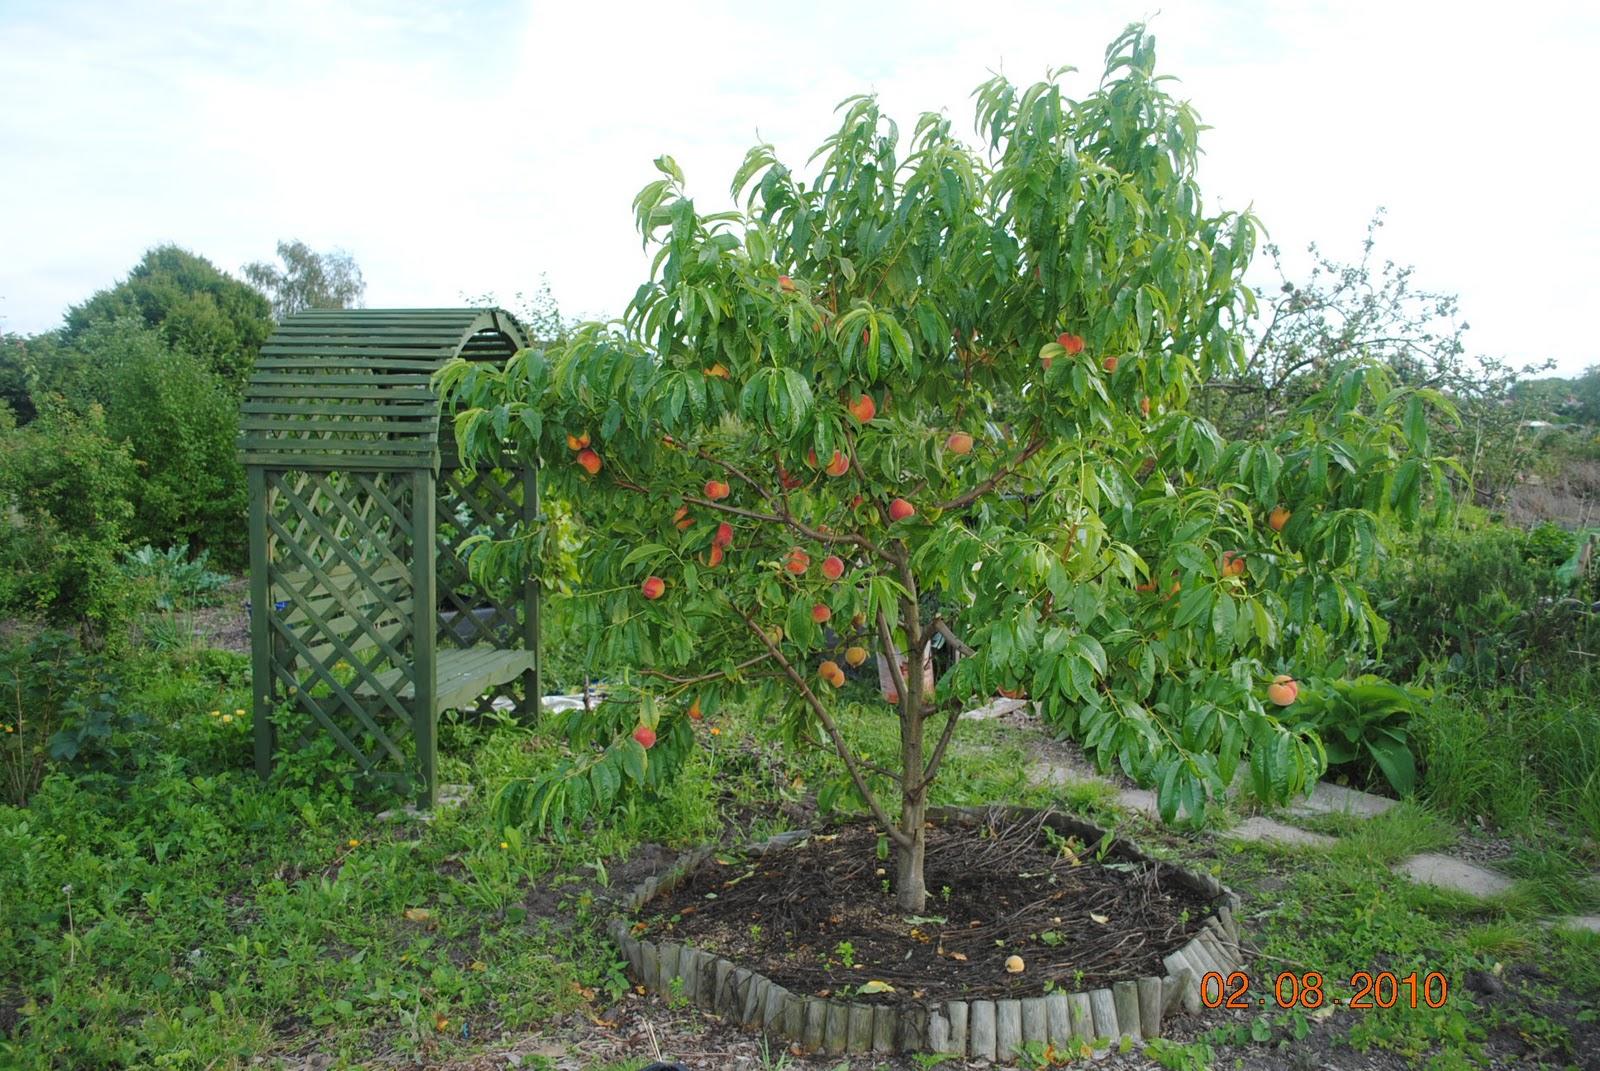 Questioner's Garden Time: Peach Harvest. Avalon Pride